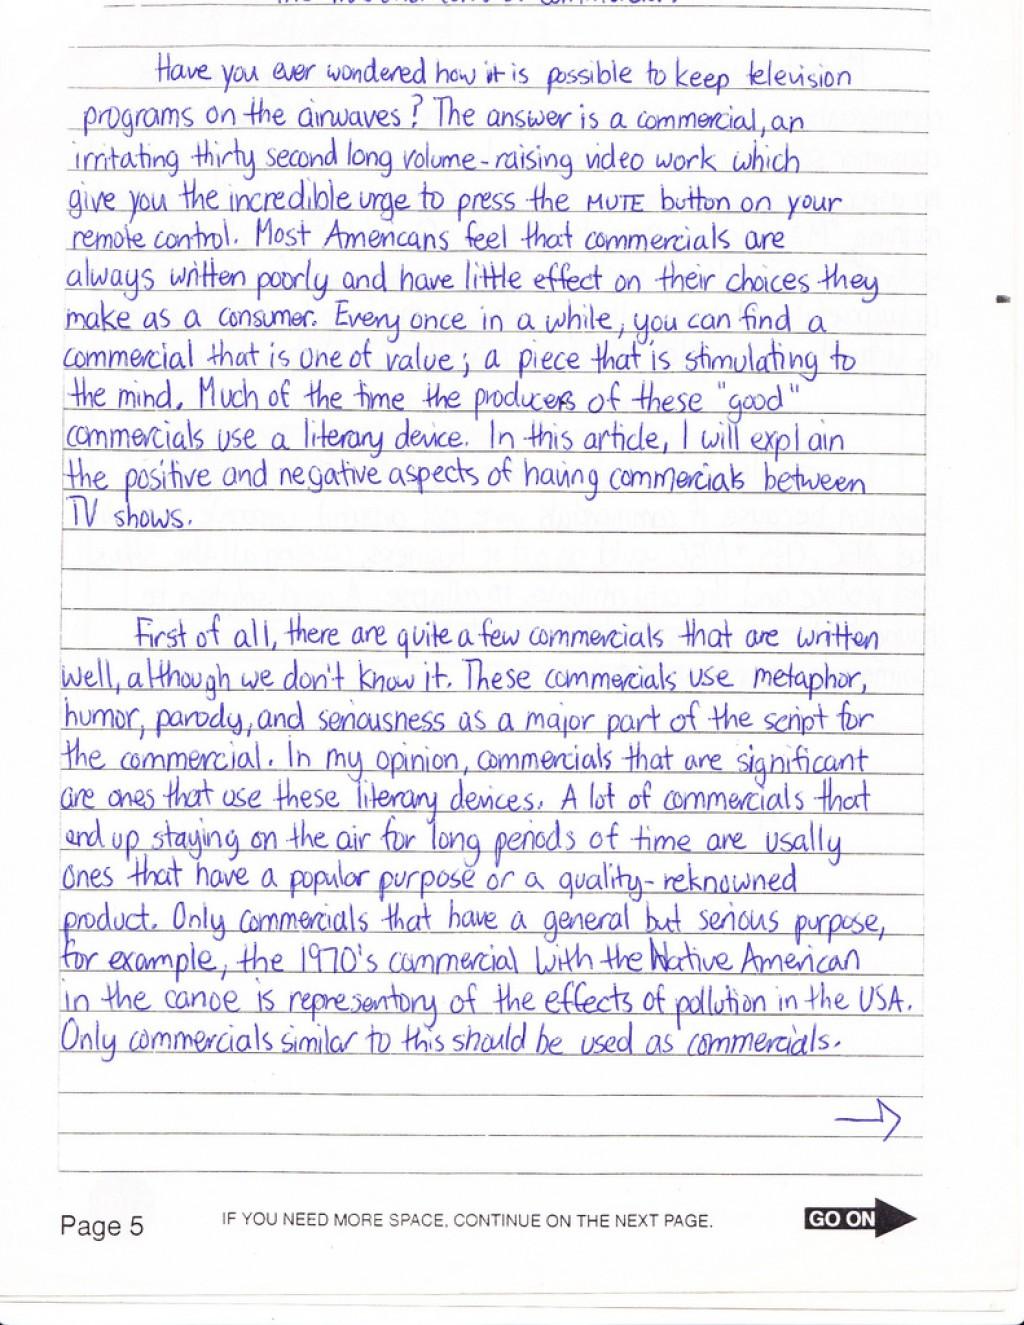 003 Essay Example Sat Average Score How To Write Imposing A Good Killer Pdf Large